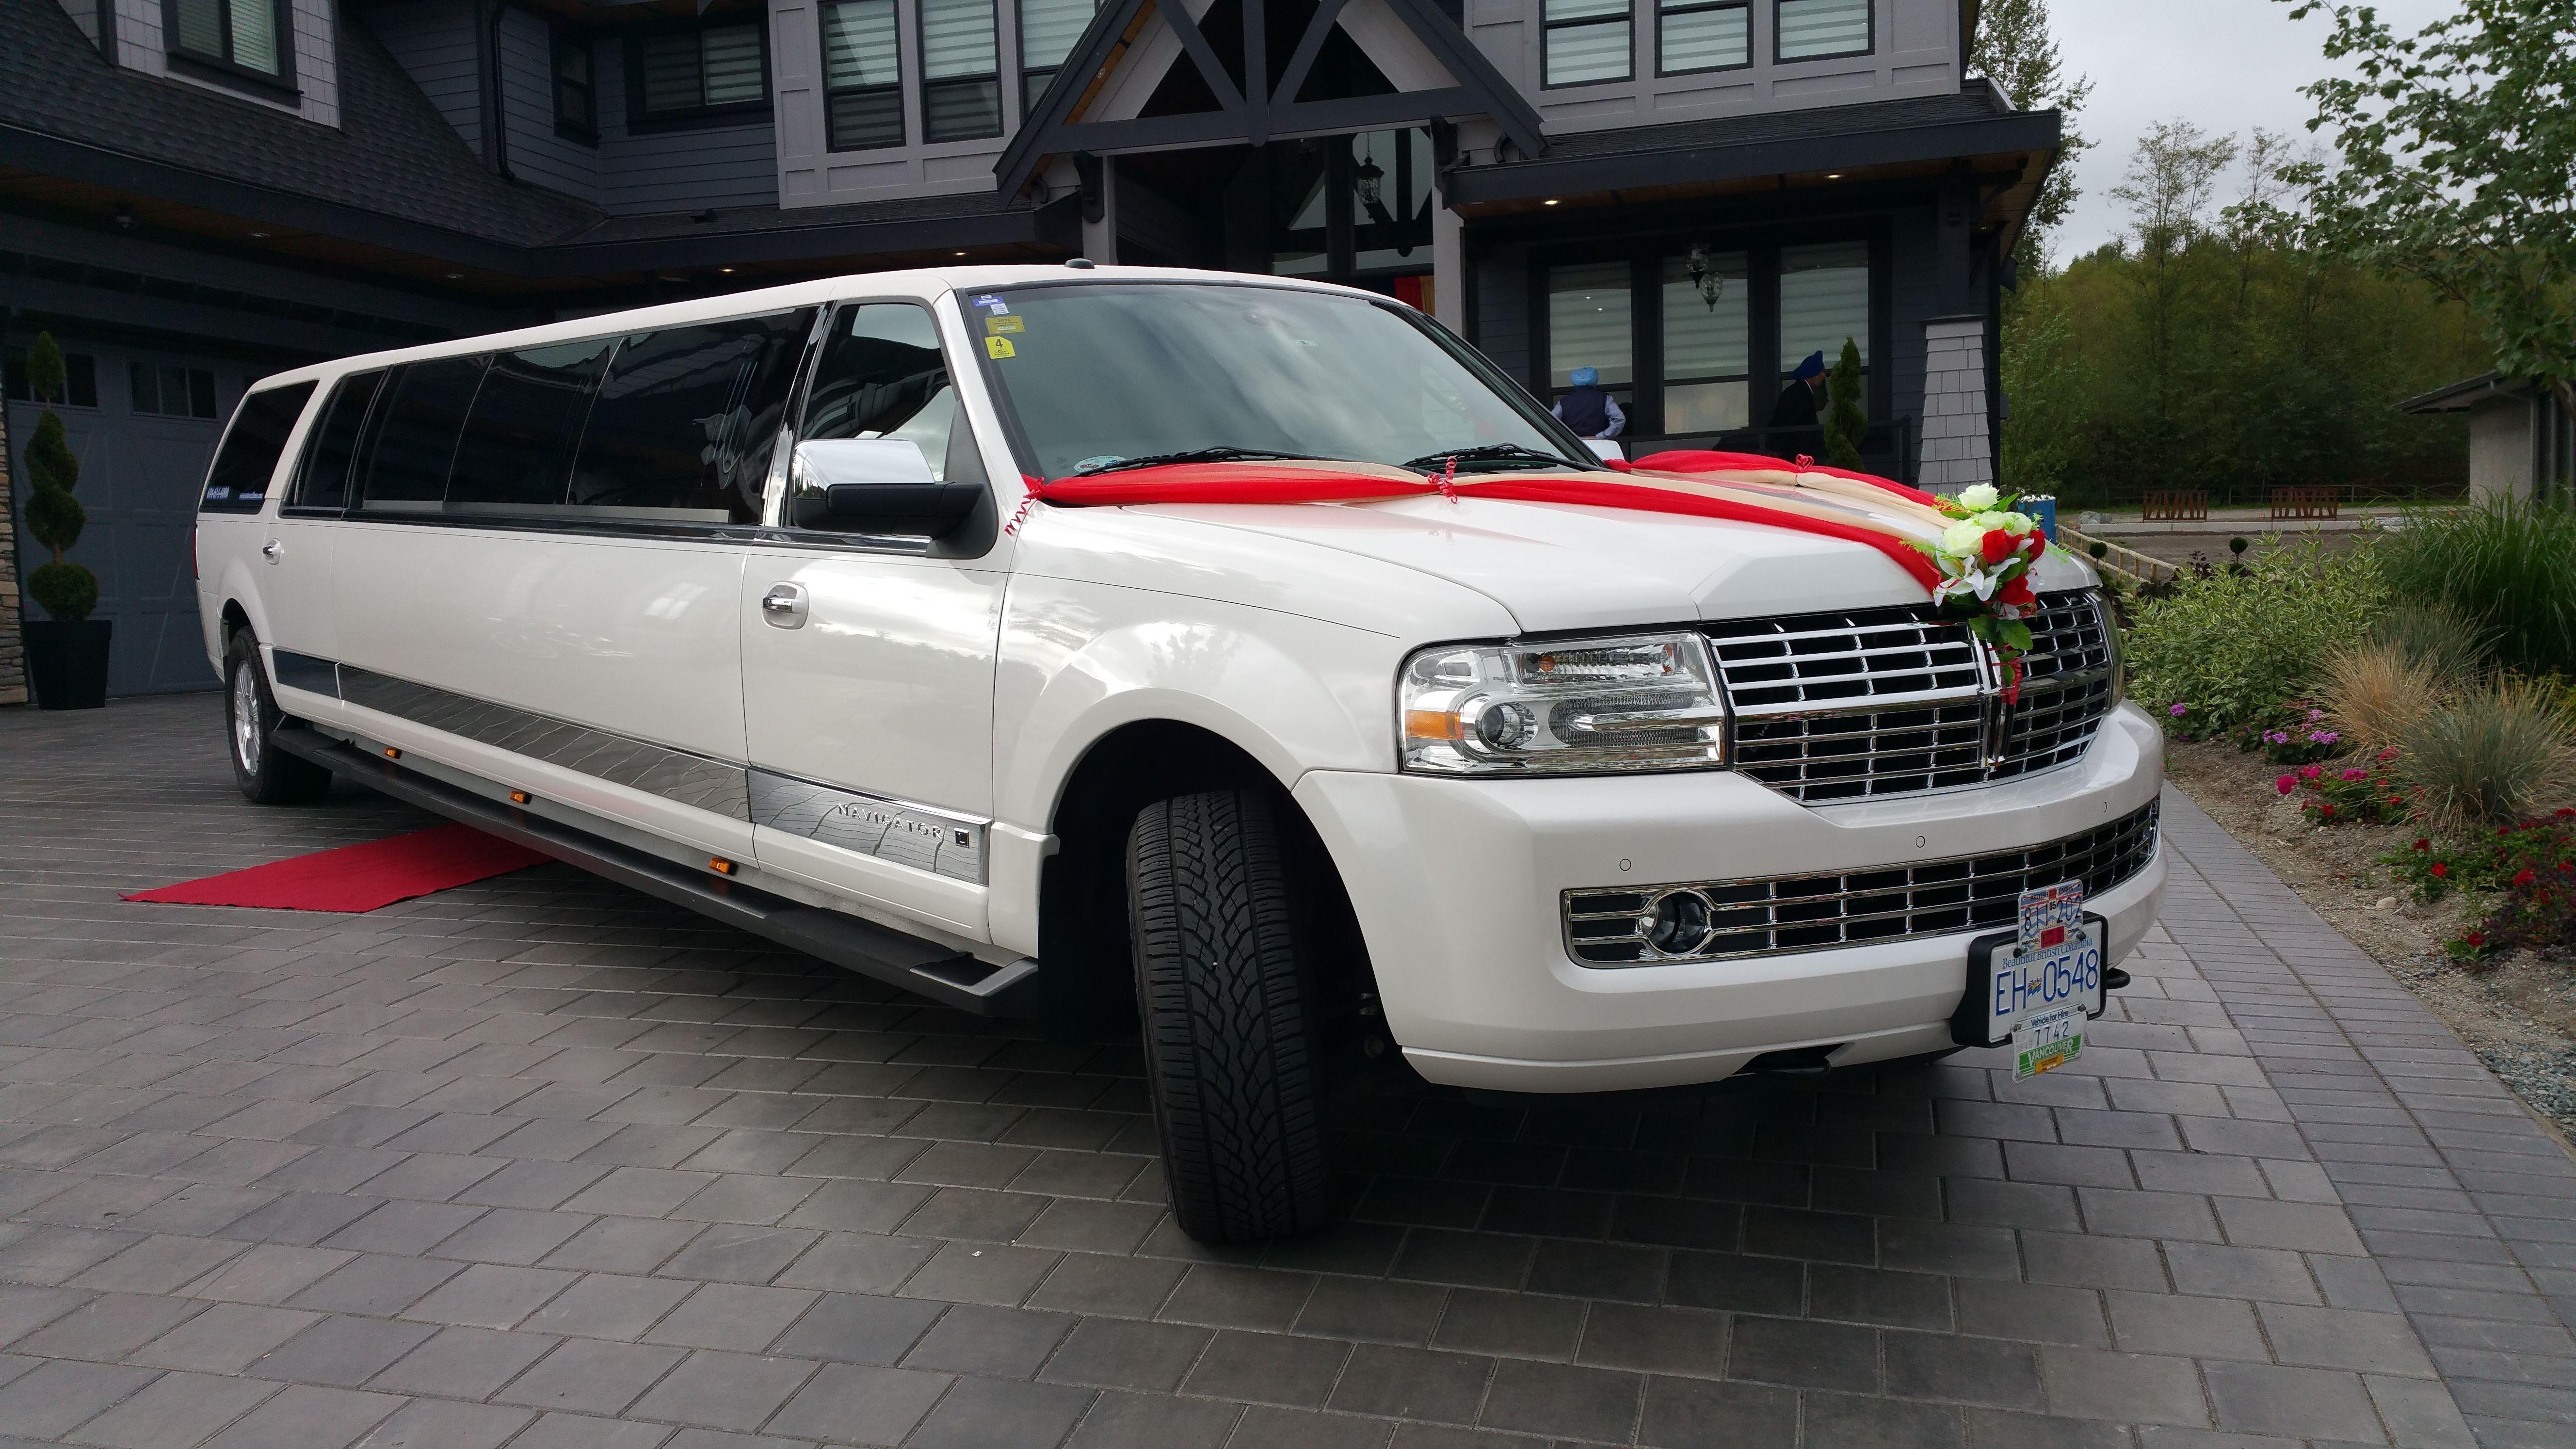 Abbotsfords premier luxury limousine service offering